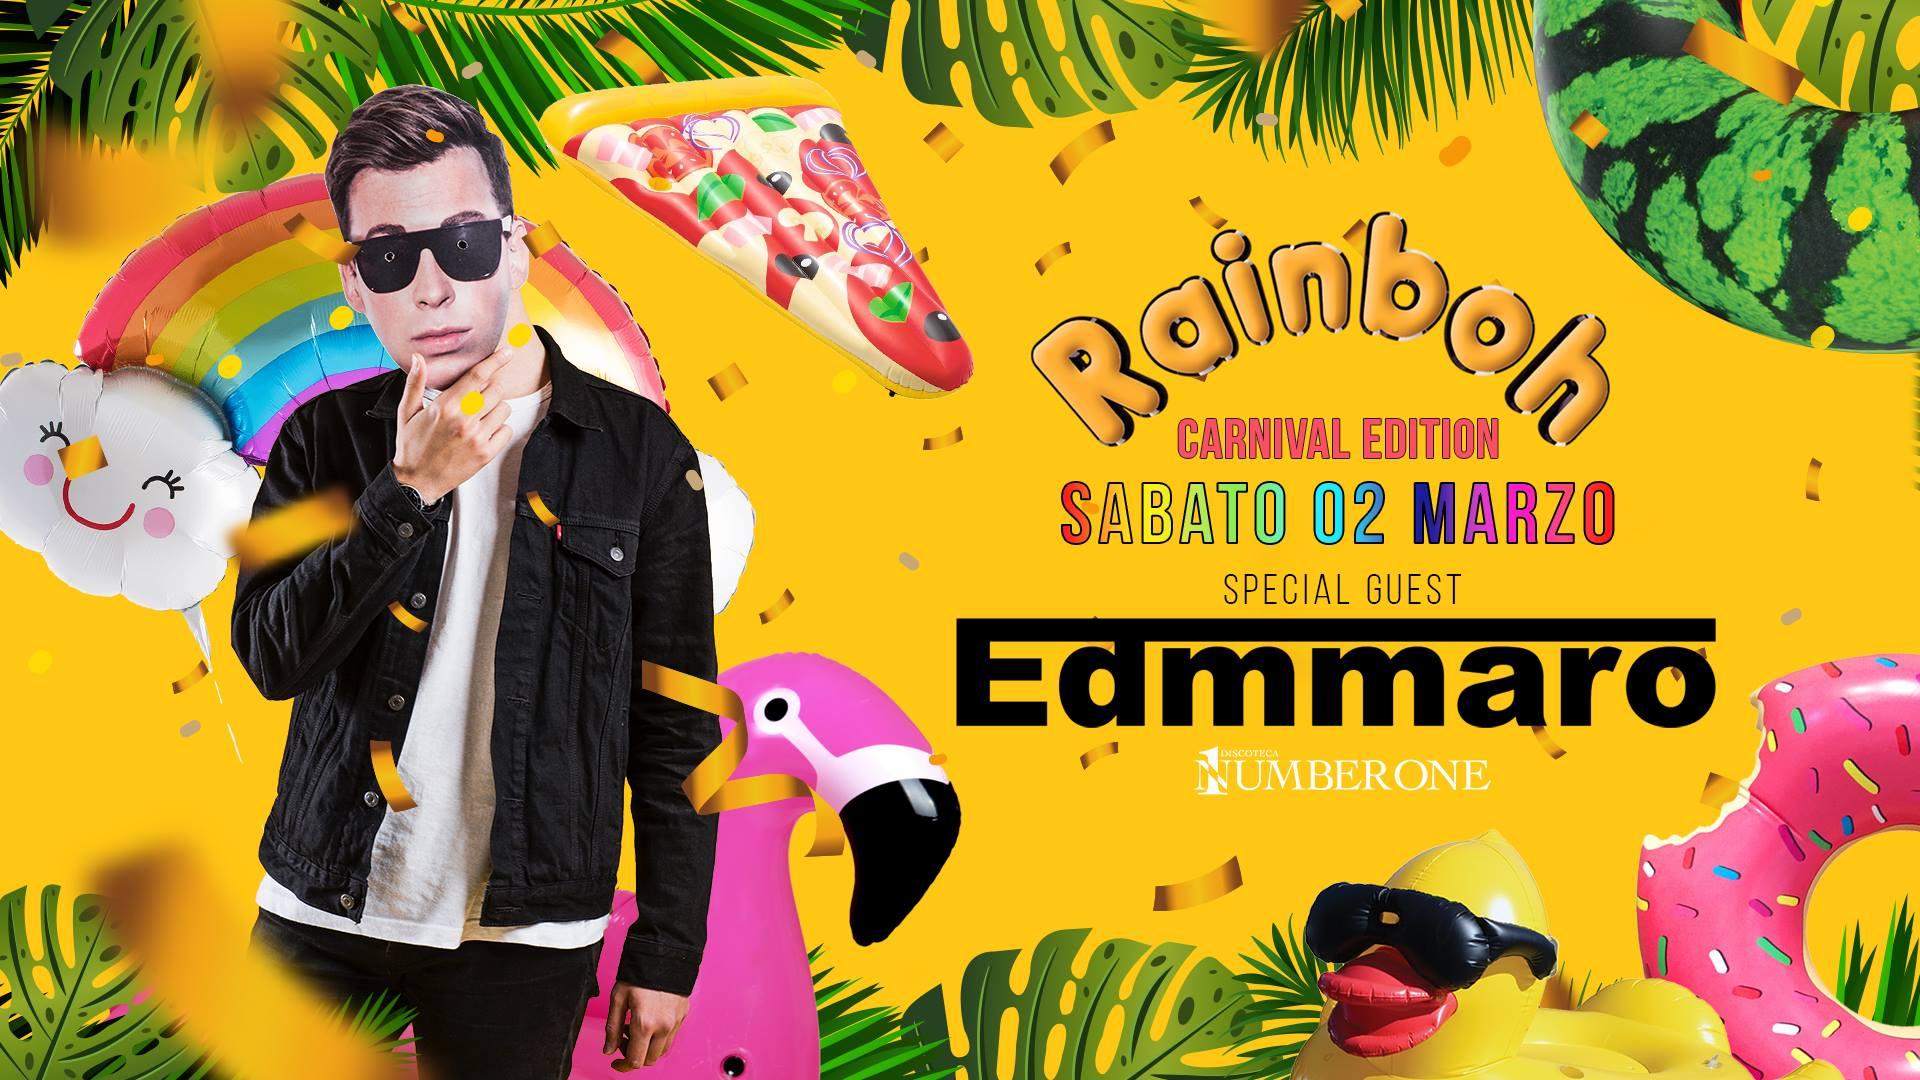 Edmmaro – Rainboh Carnival Edition